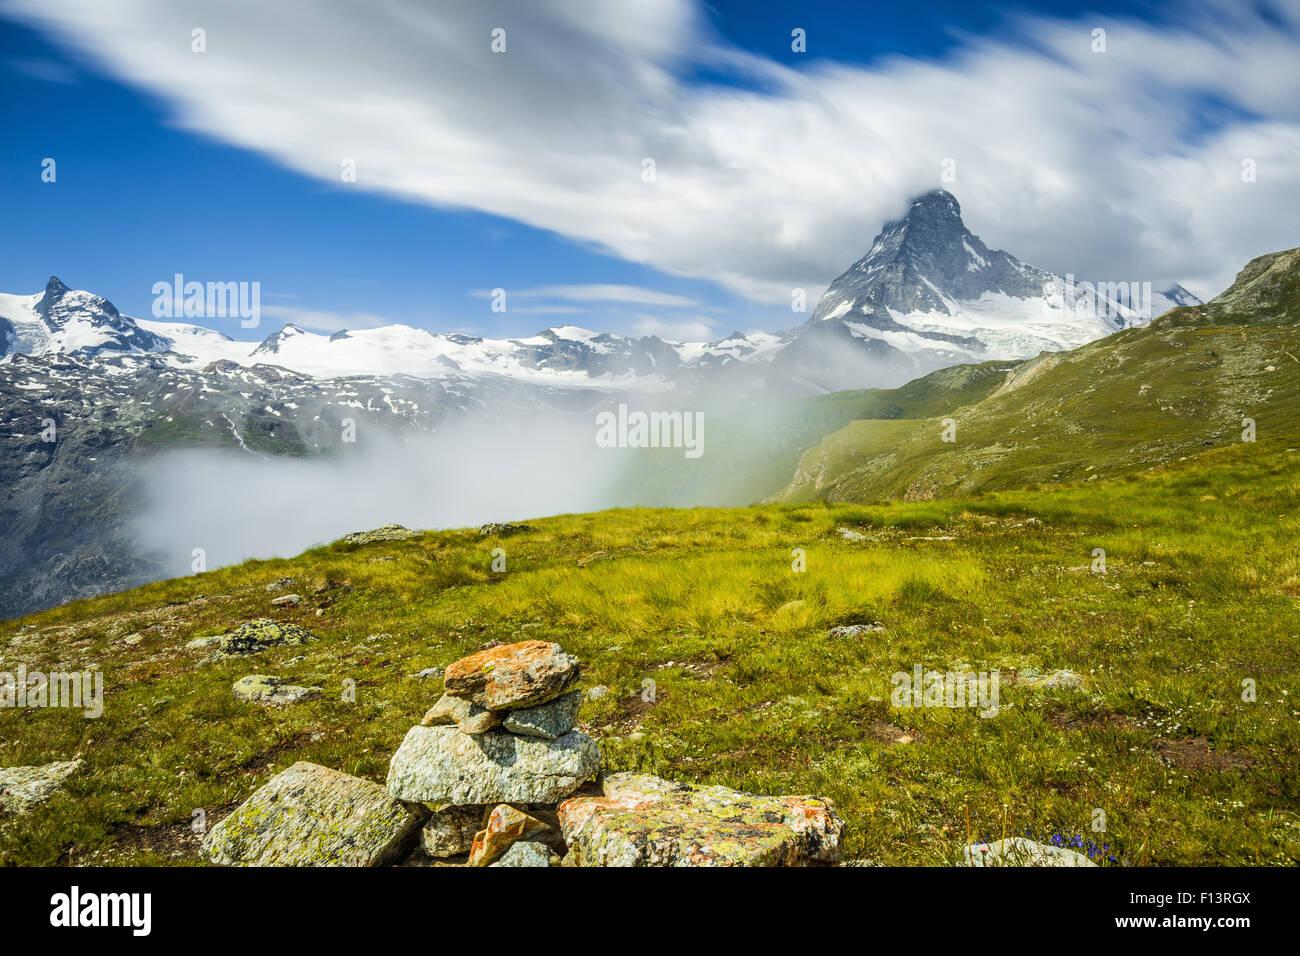 The Matterhorn (Cervino).  Alpine landscape. Switzerland - Stock Image